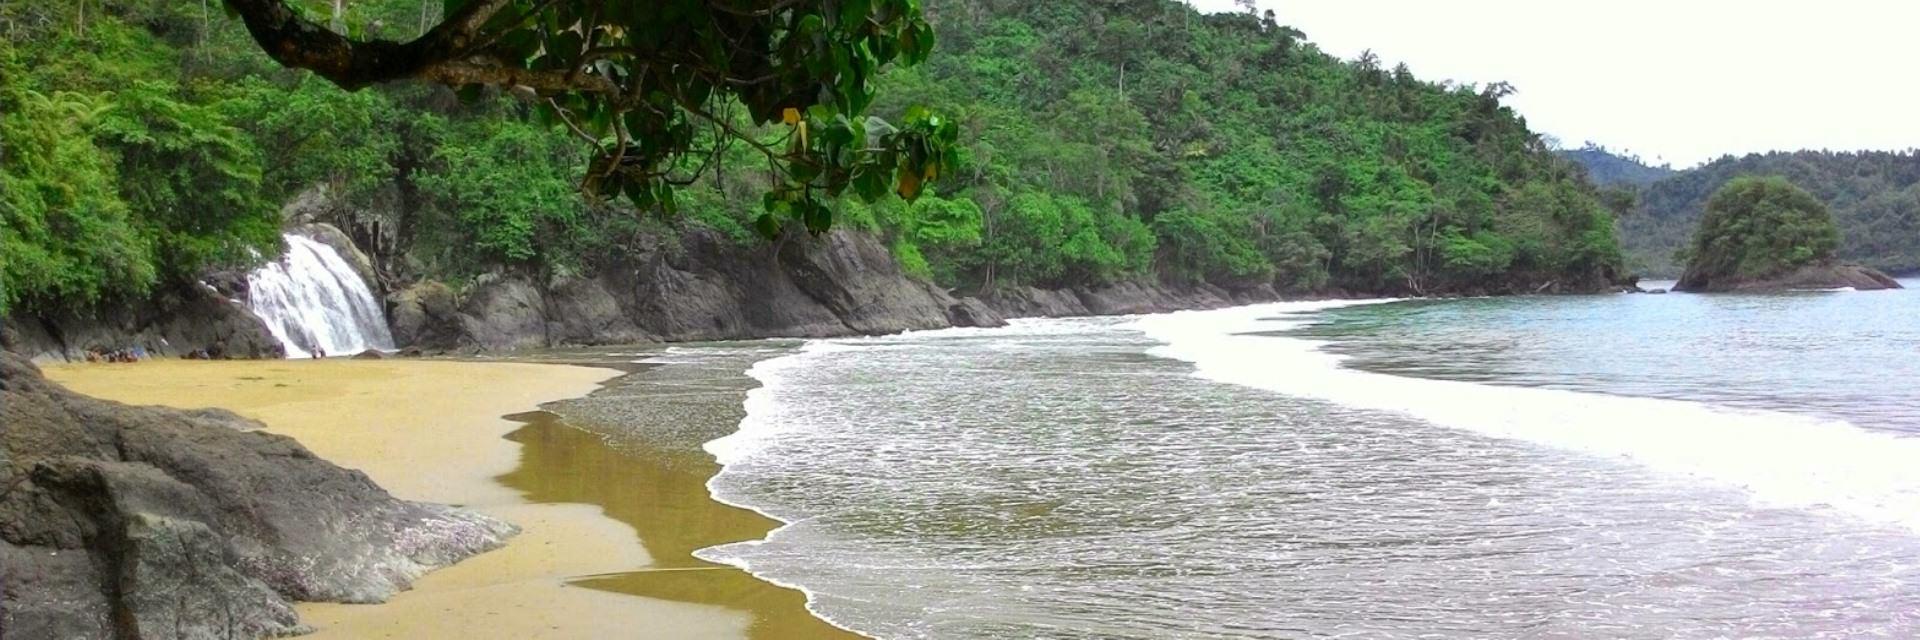 10 Pantai Unik Malang Raya Seakan Menjadi Surga Dolaners Jonggring